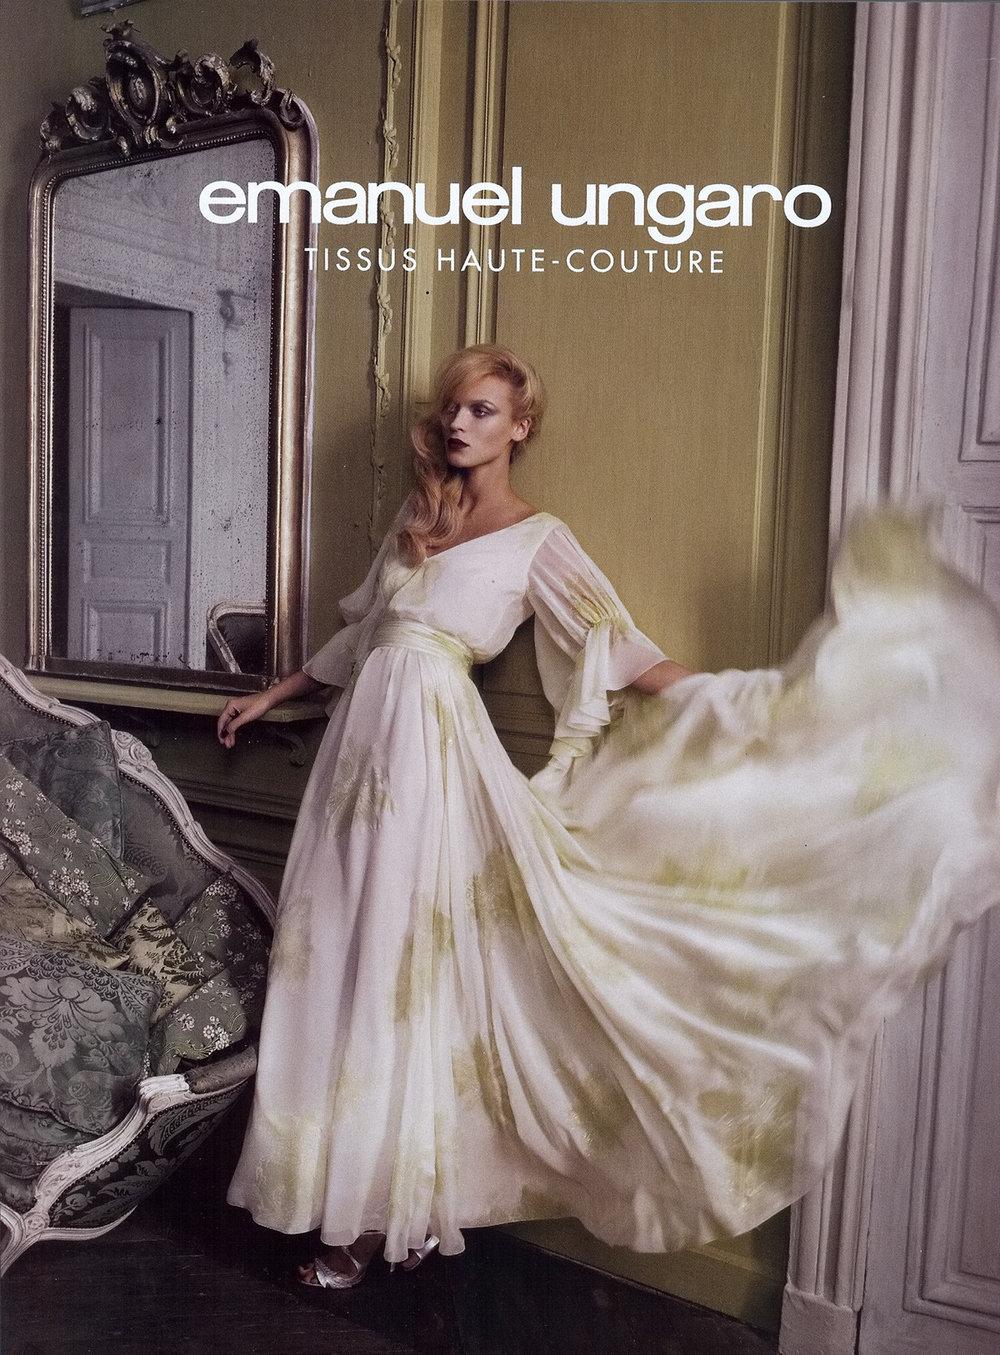 7 Annna Tokarska Emanuel Ungaro Haute Couture .jpg